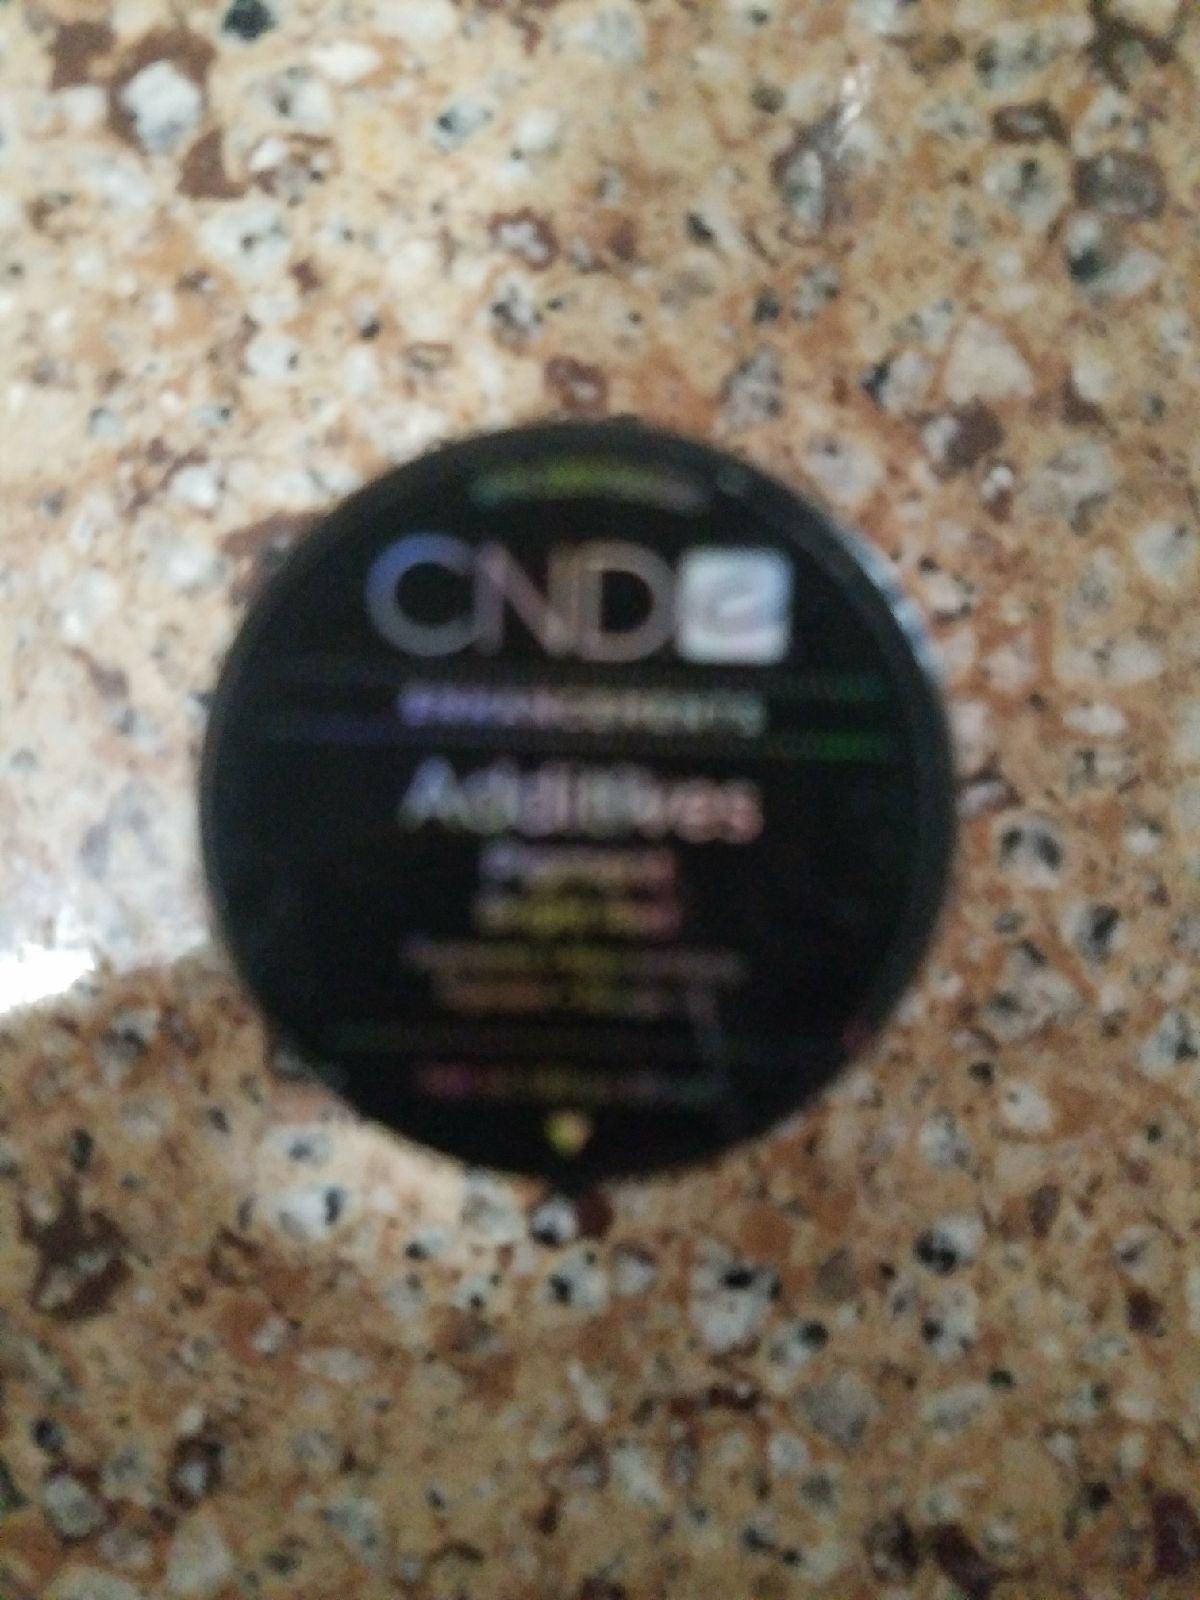 Cnd additives  bright red powder